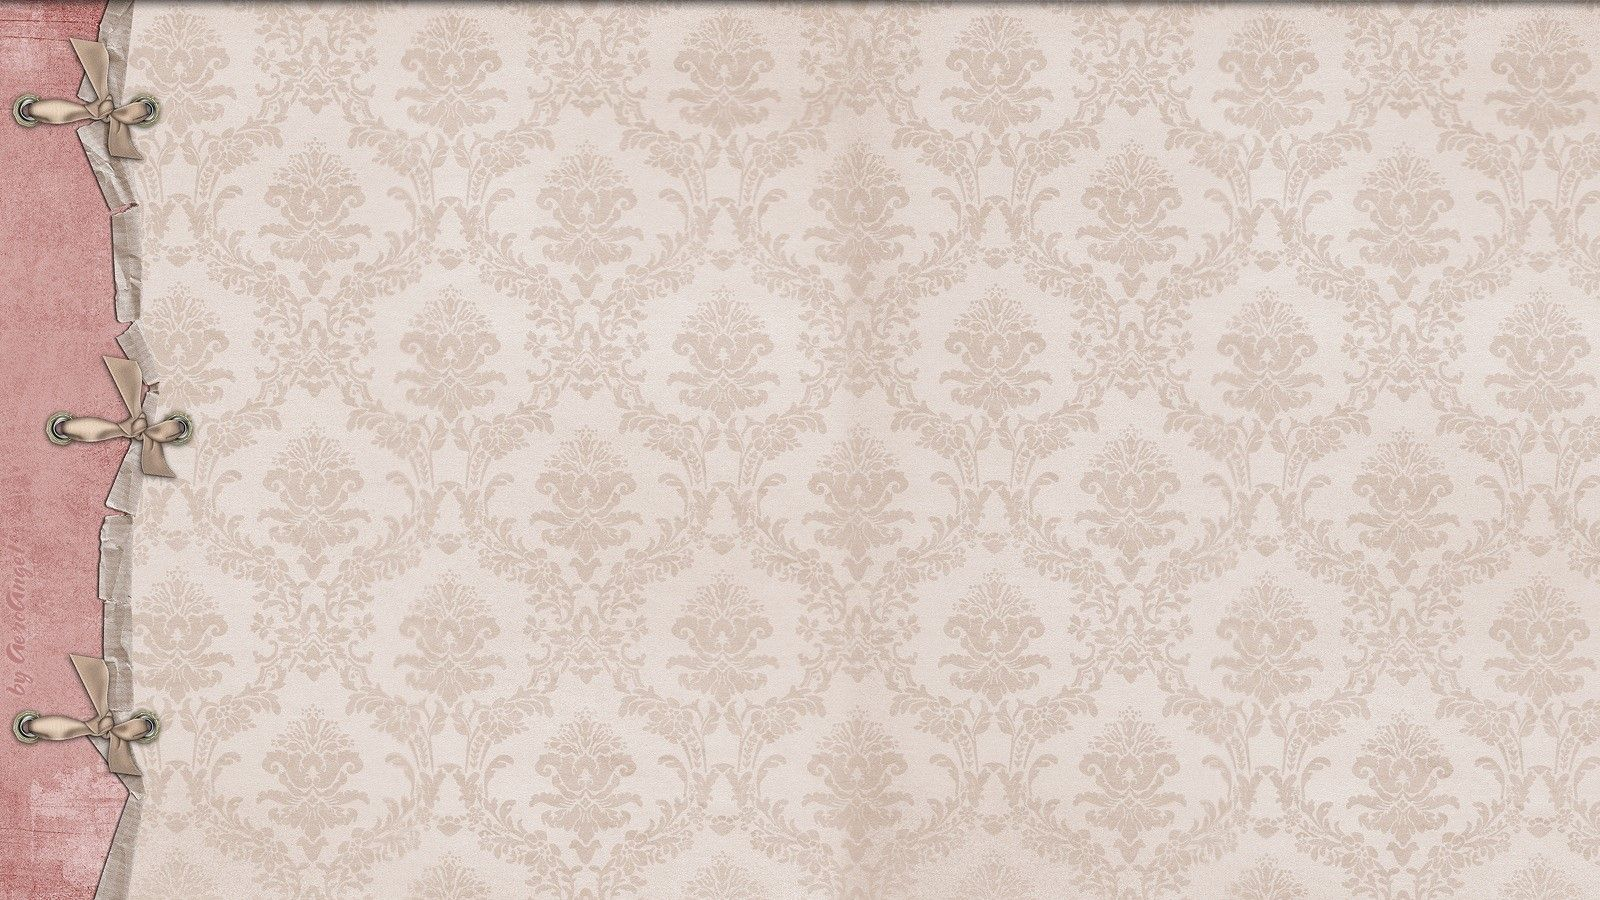 Retro Girly Wallpaper